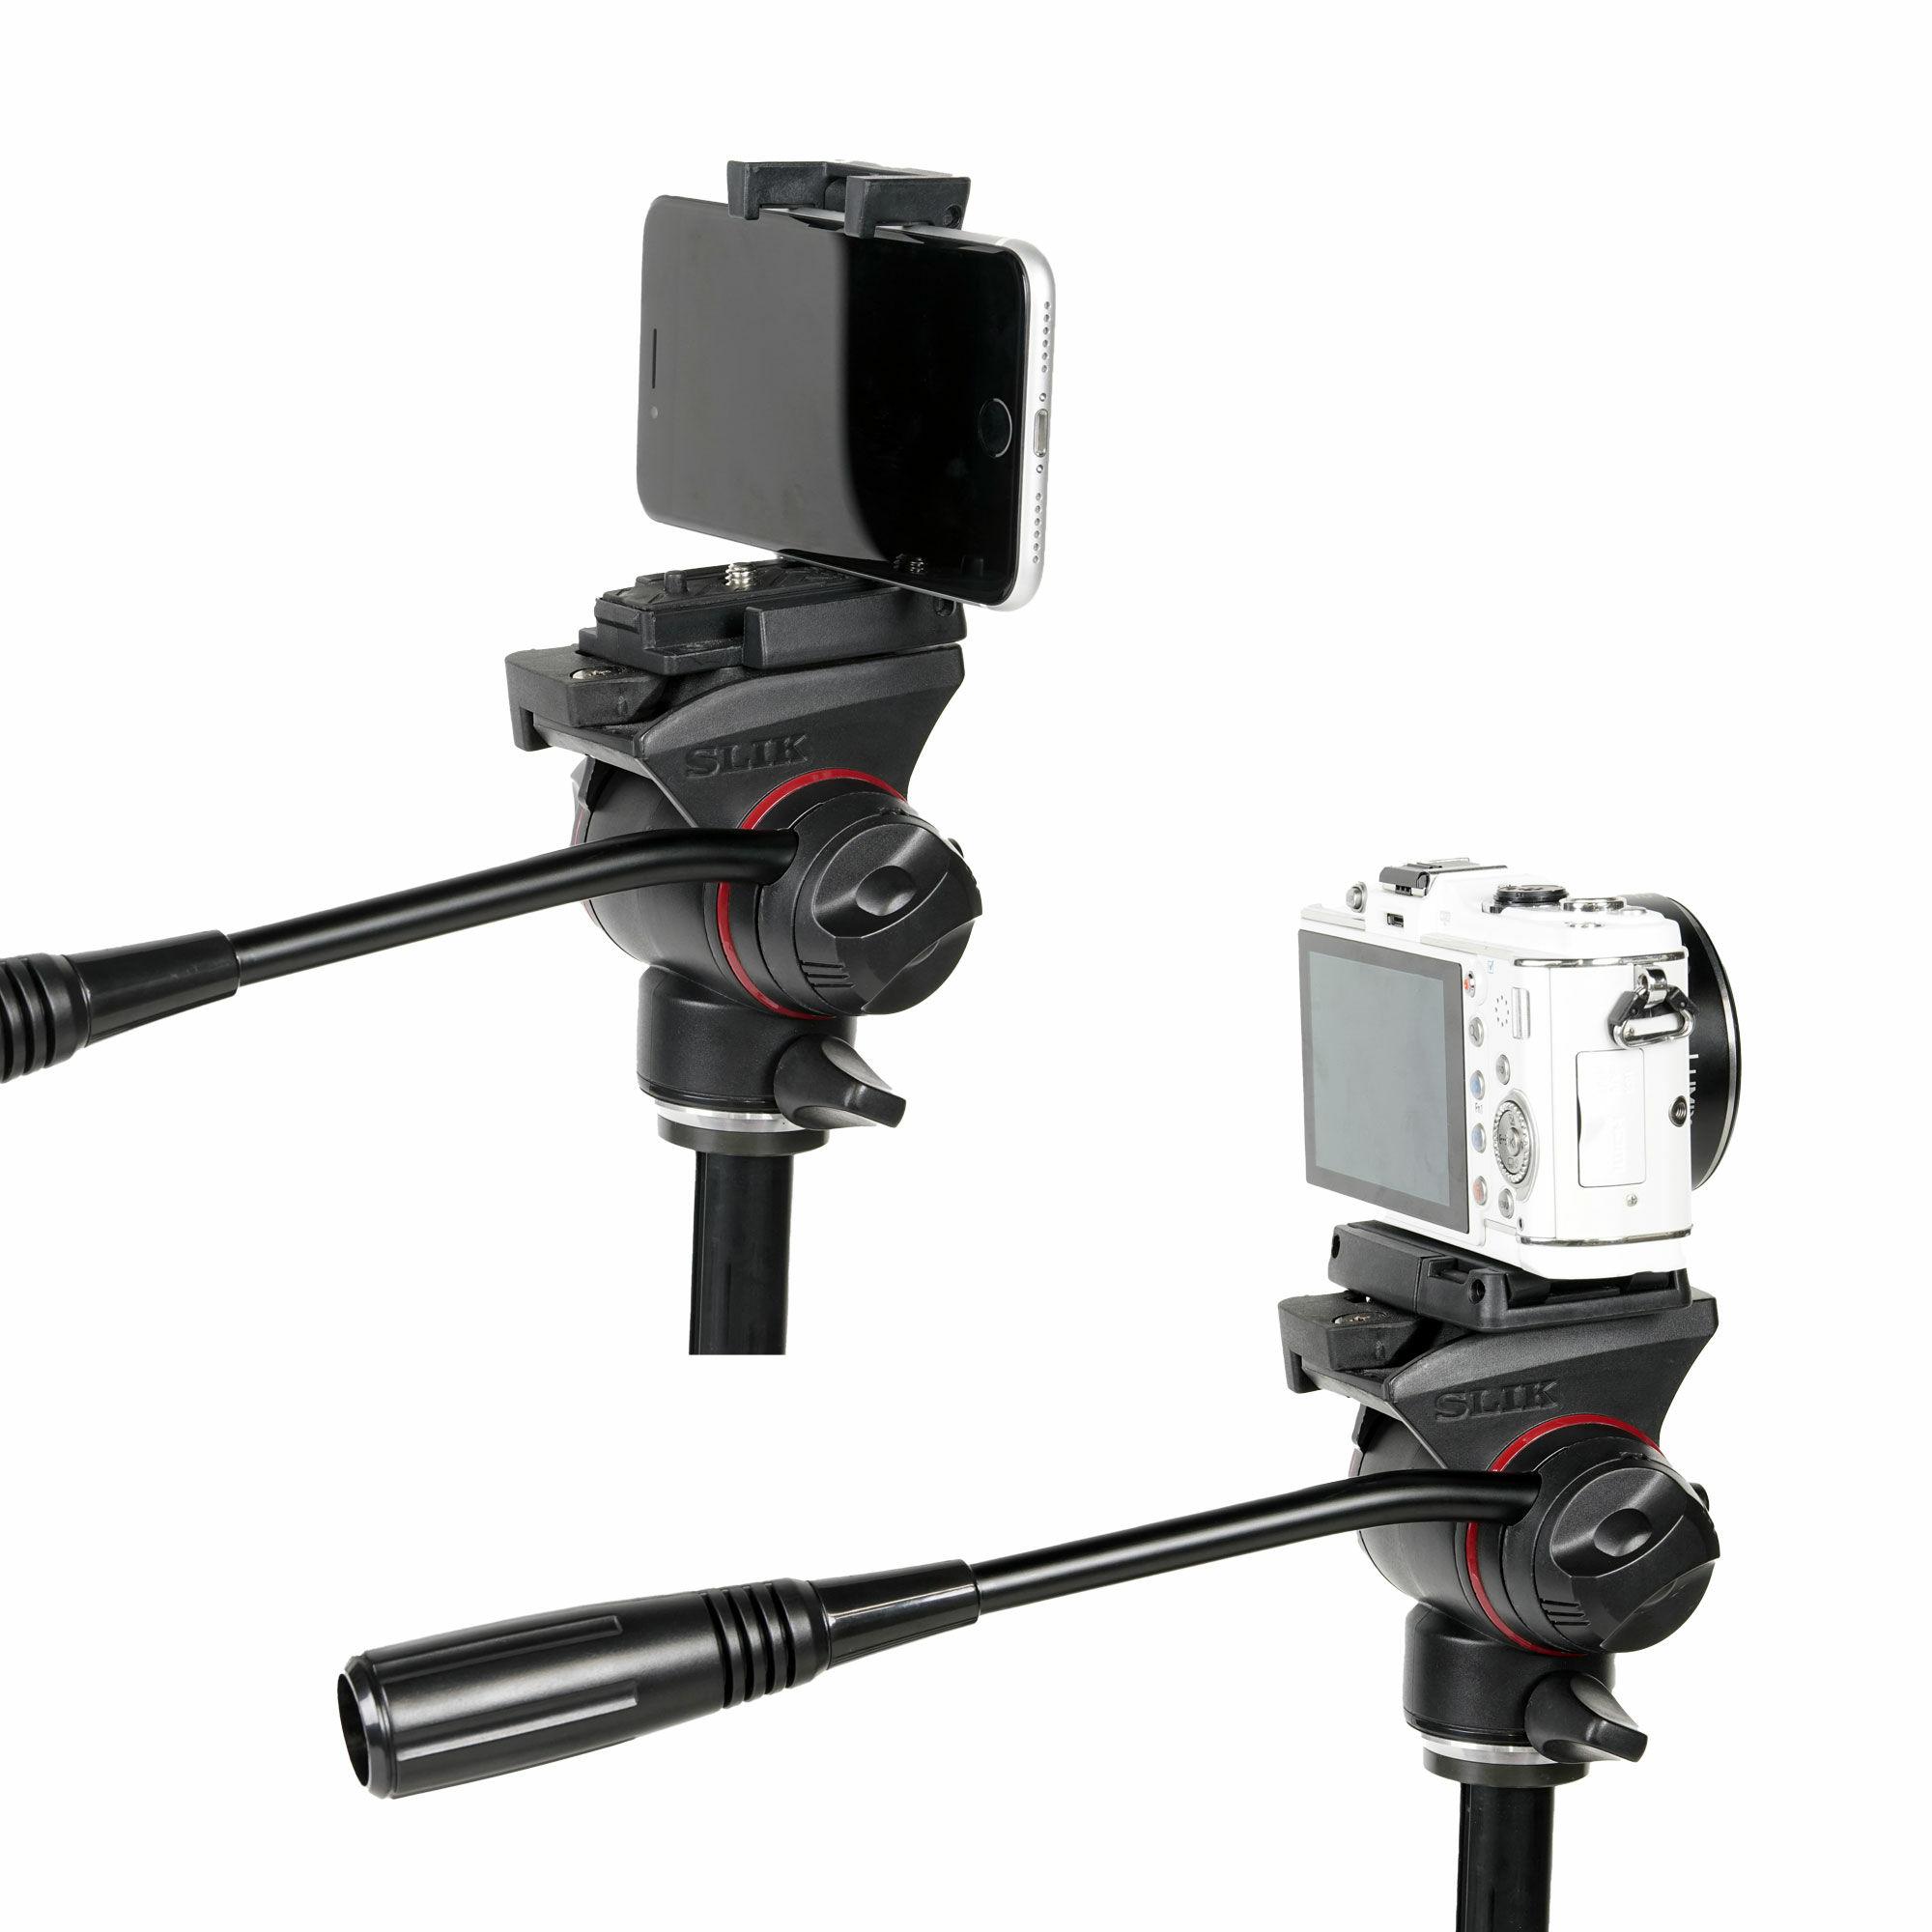 gxm7500video_features02.jpg